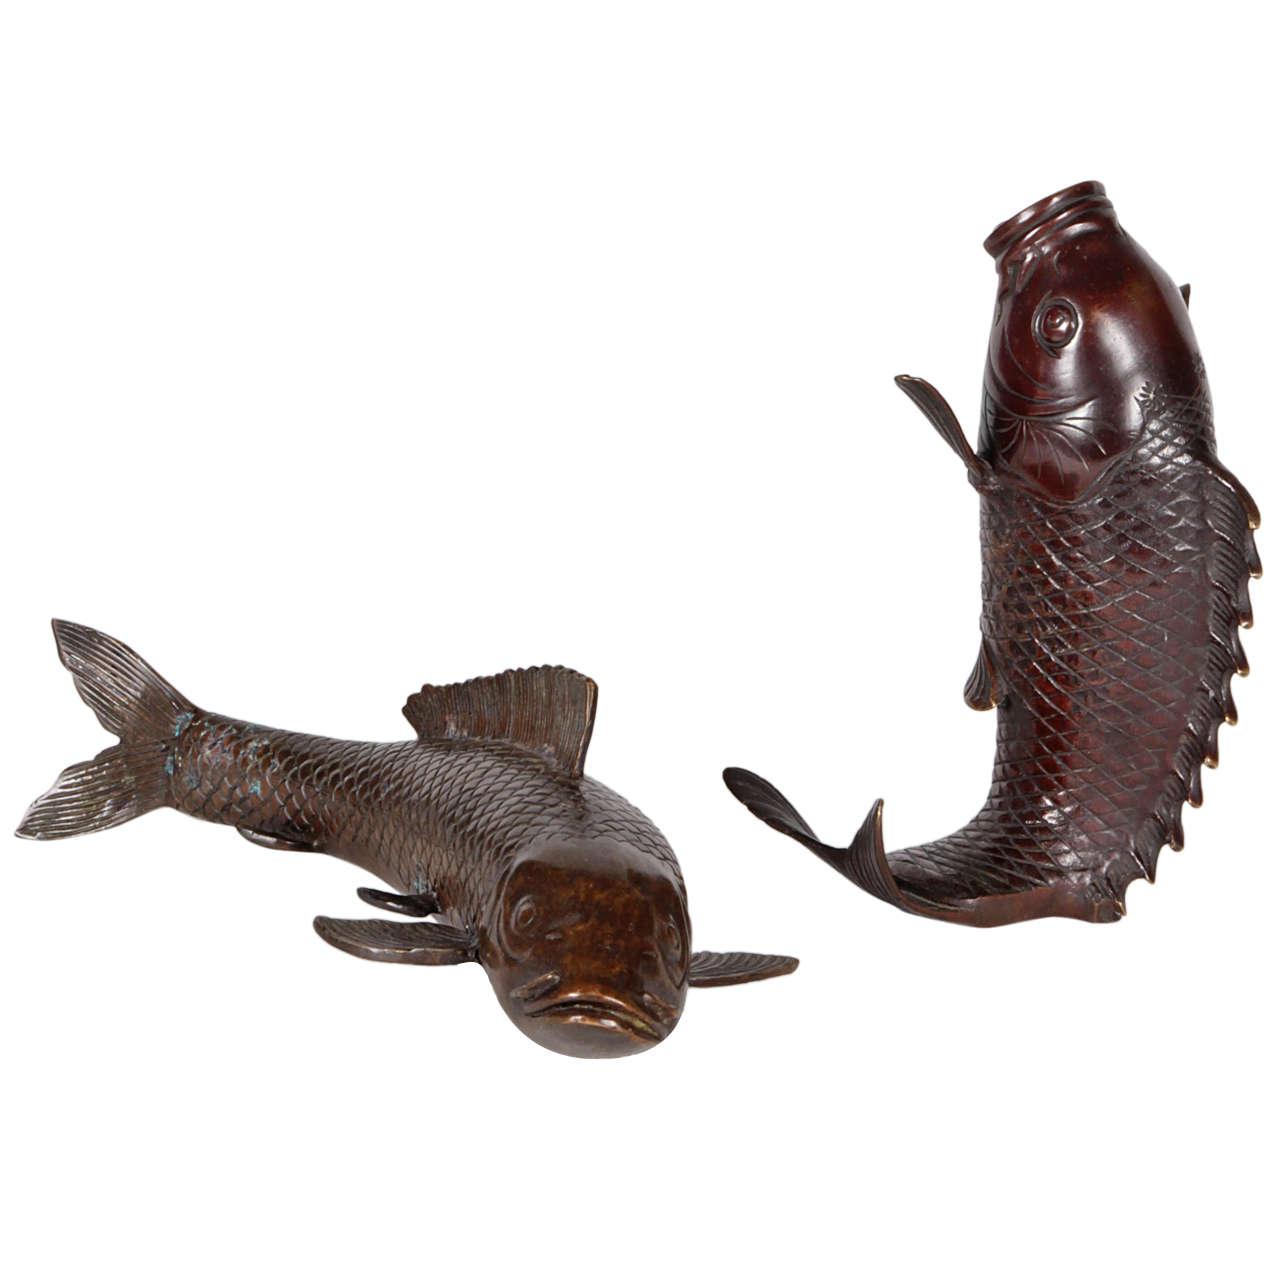 Japanese Meiji Period Quot Koi Quot Fish Bronze Sculpture And Vase